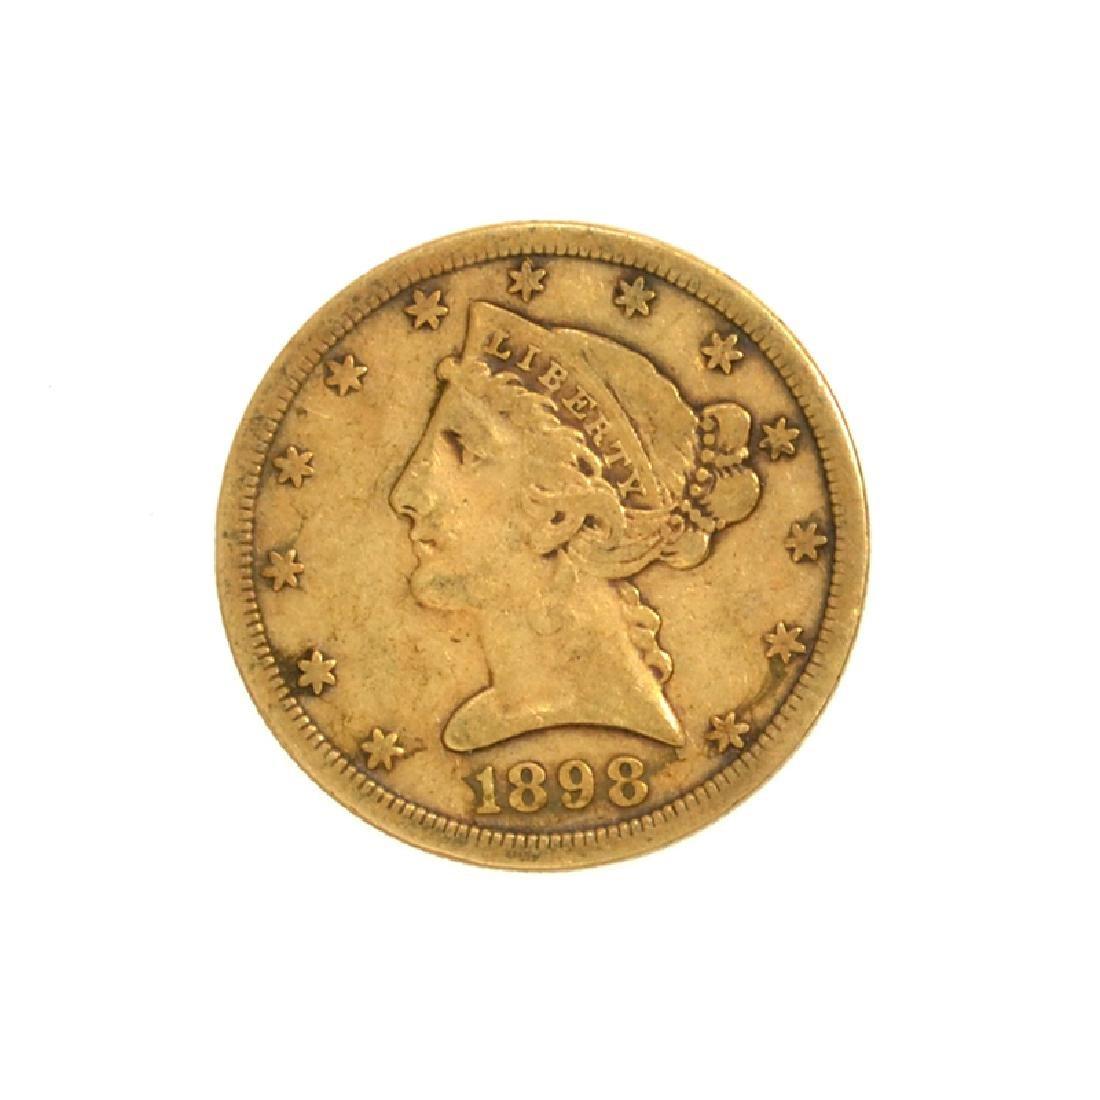 1898-S $5 U.S. Liberty Head Gold Coin (DF)